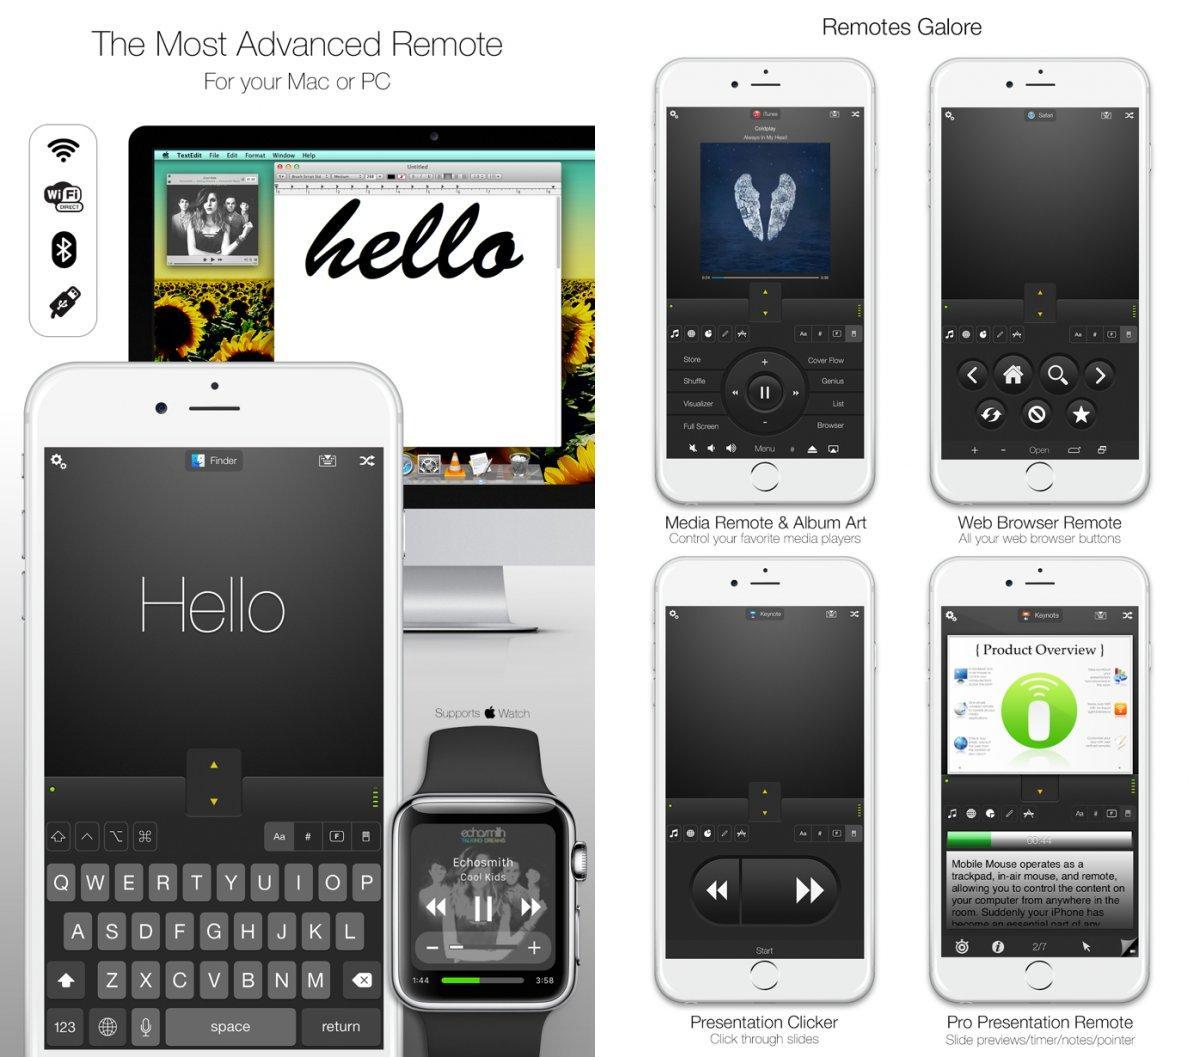 Mobile mouse remote app